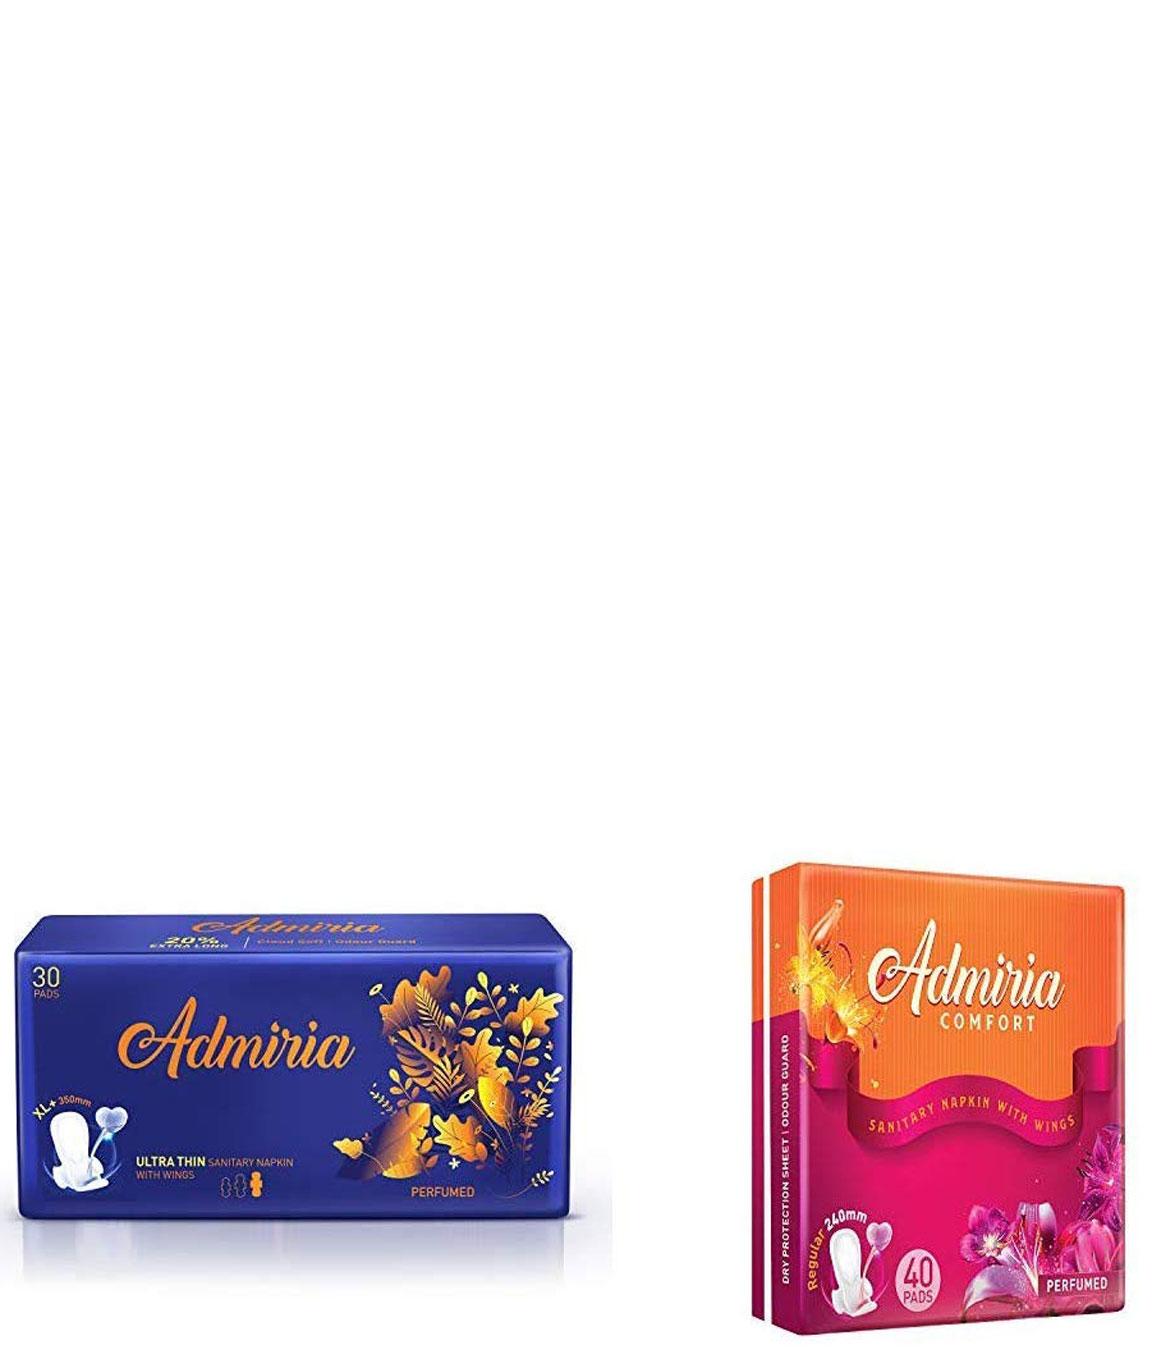 Admiria Ultra Thin Cloud Soft Sanitary Pad/Napkins - Extra Large (XL+) (Pack of 30) & Admiria Comfort Sanitary Pad/Napkins - Regular (Pack of 40)